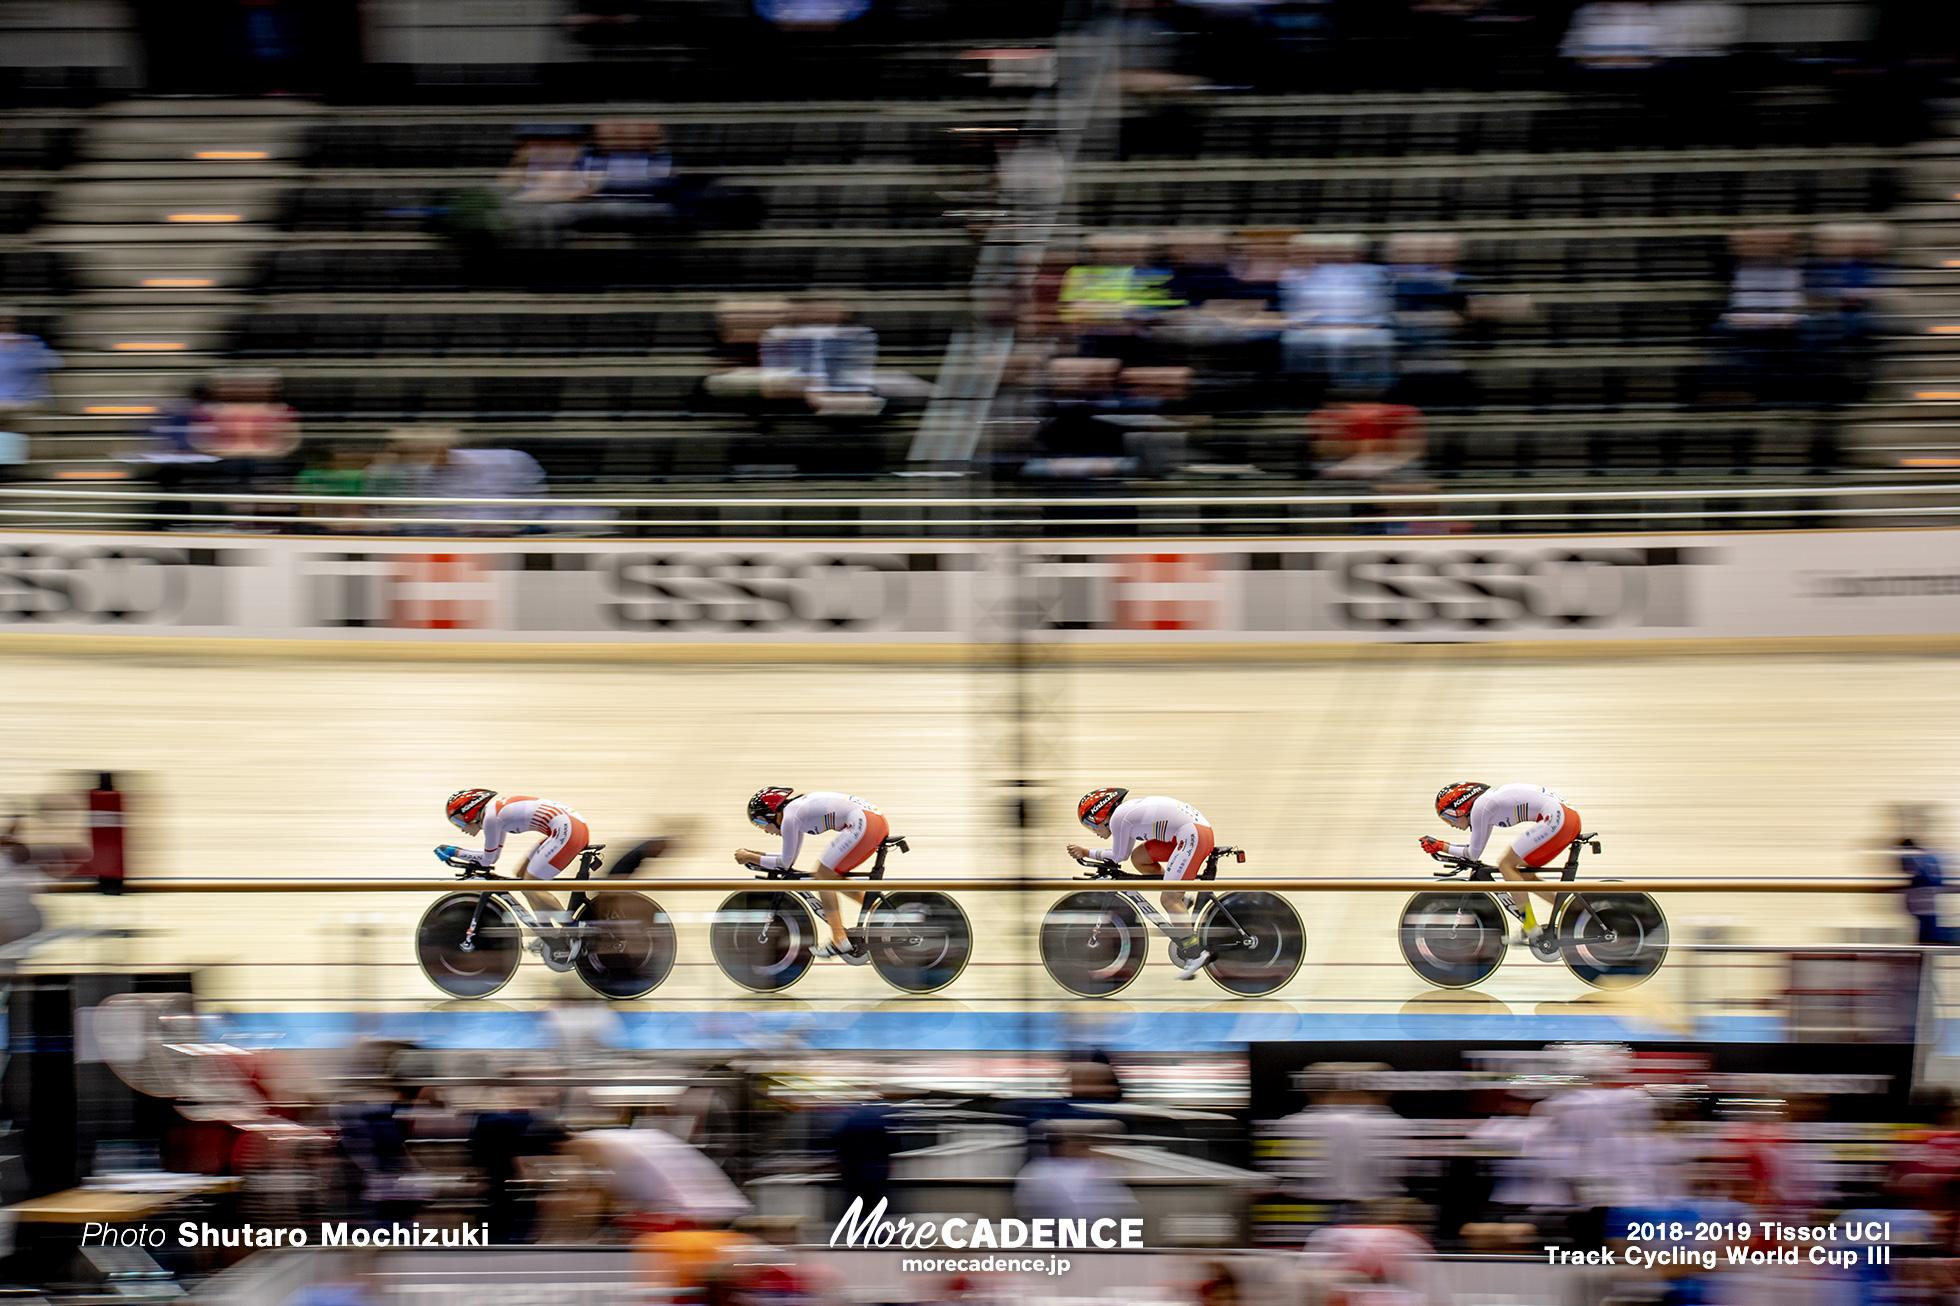 Japan/Women's Team Purusuit/2018-2019 Track Cycling World Cup III Berlin